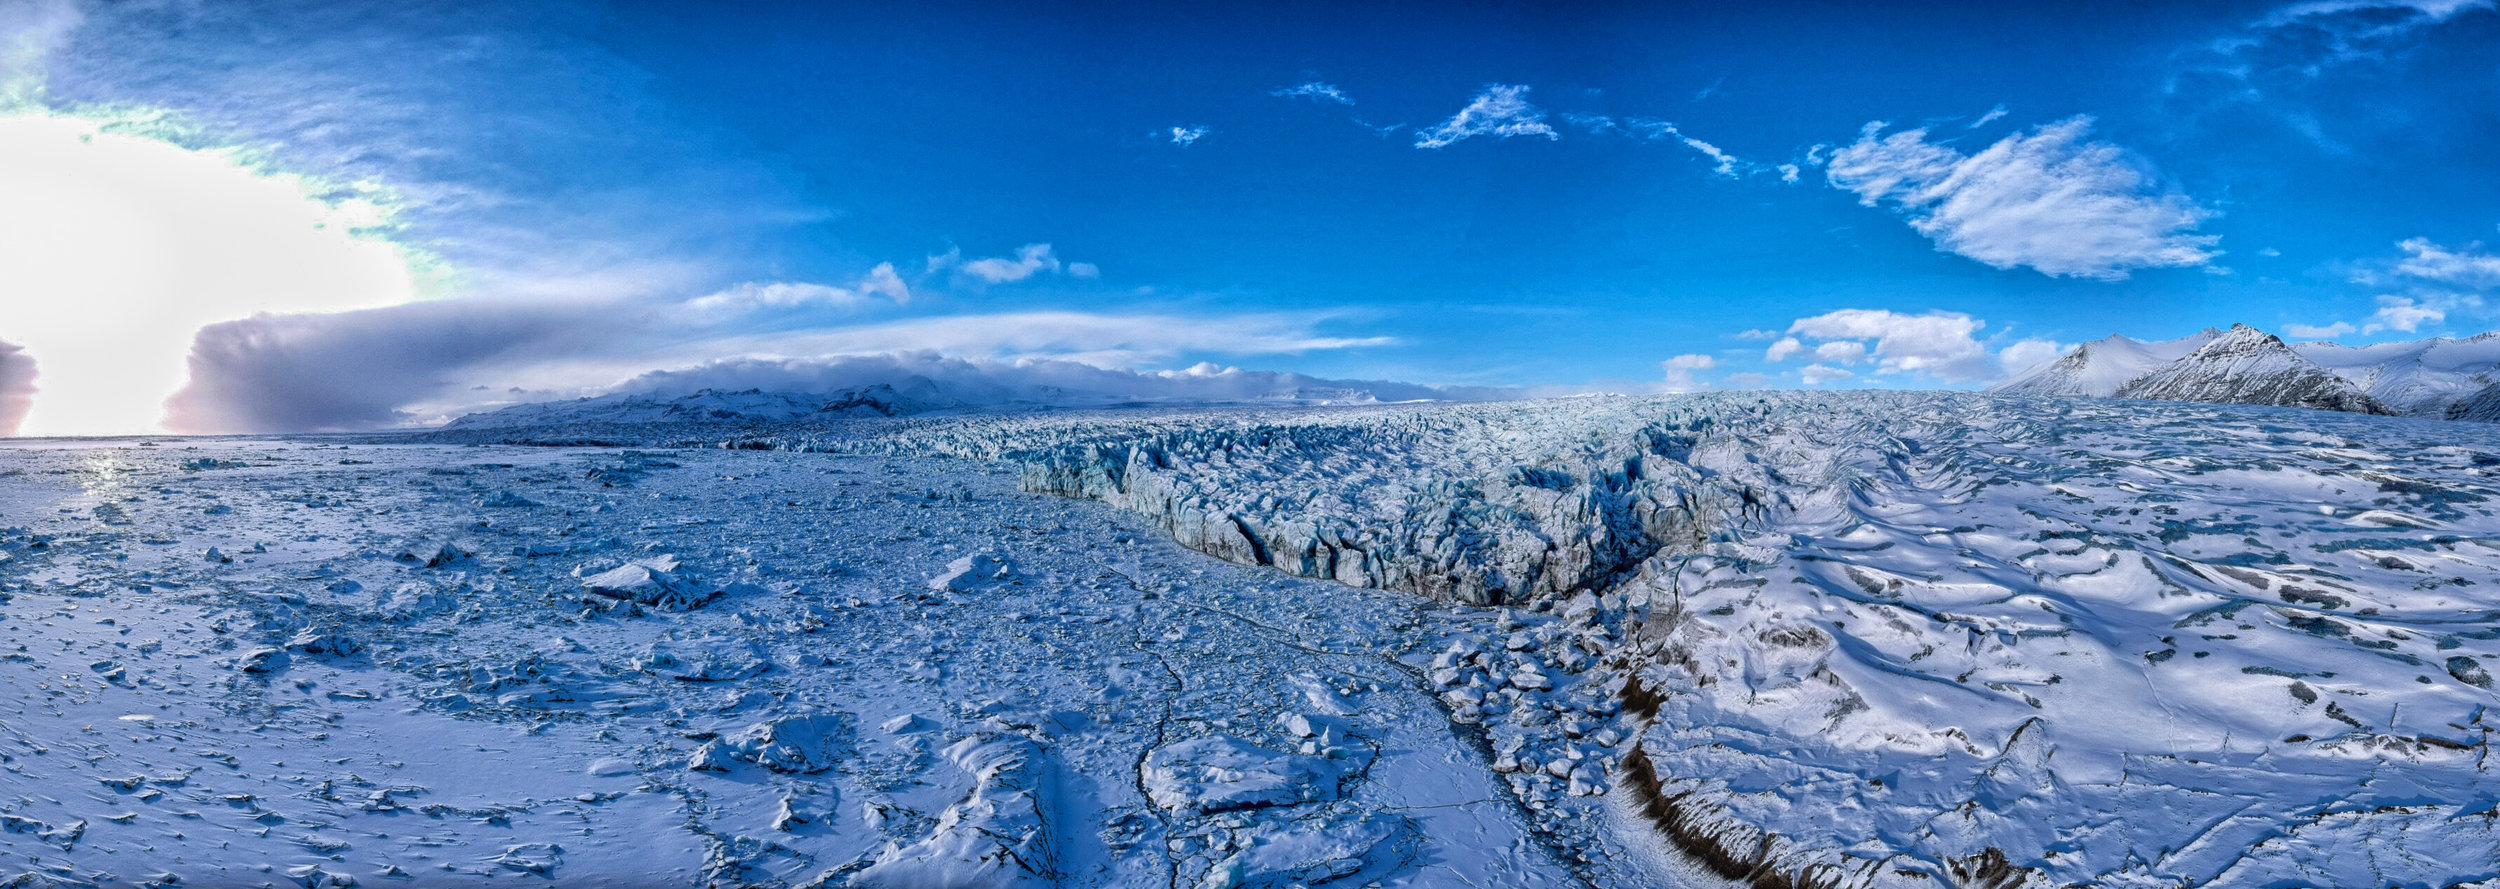 Iceland 2018 - Drone Pano--5.jpg